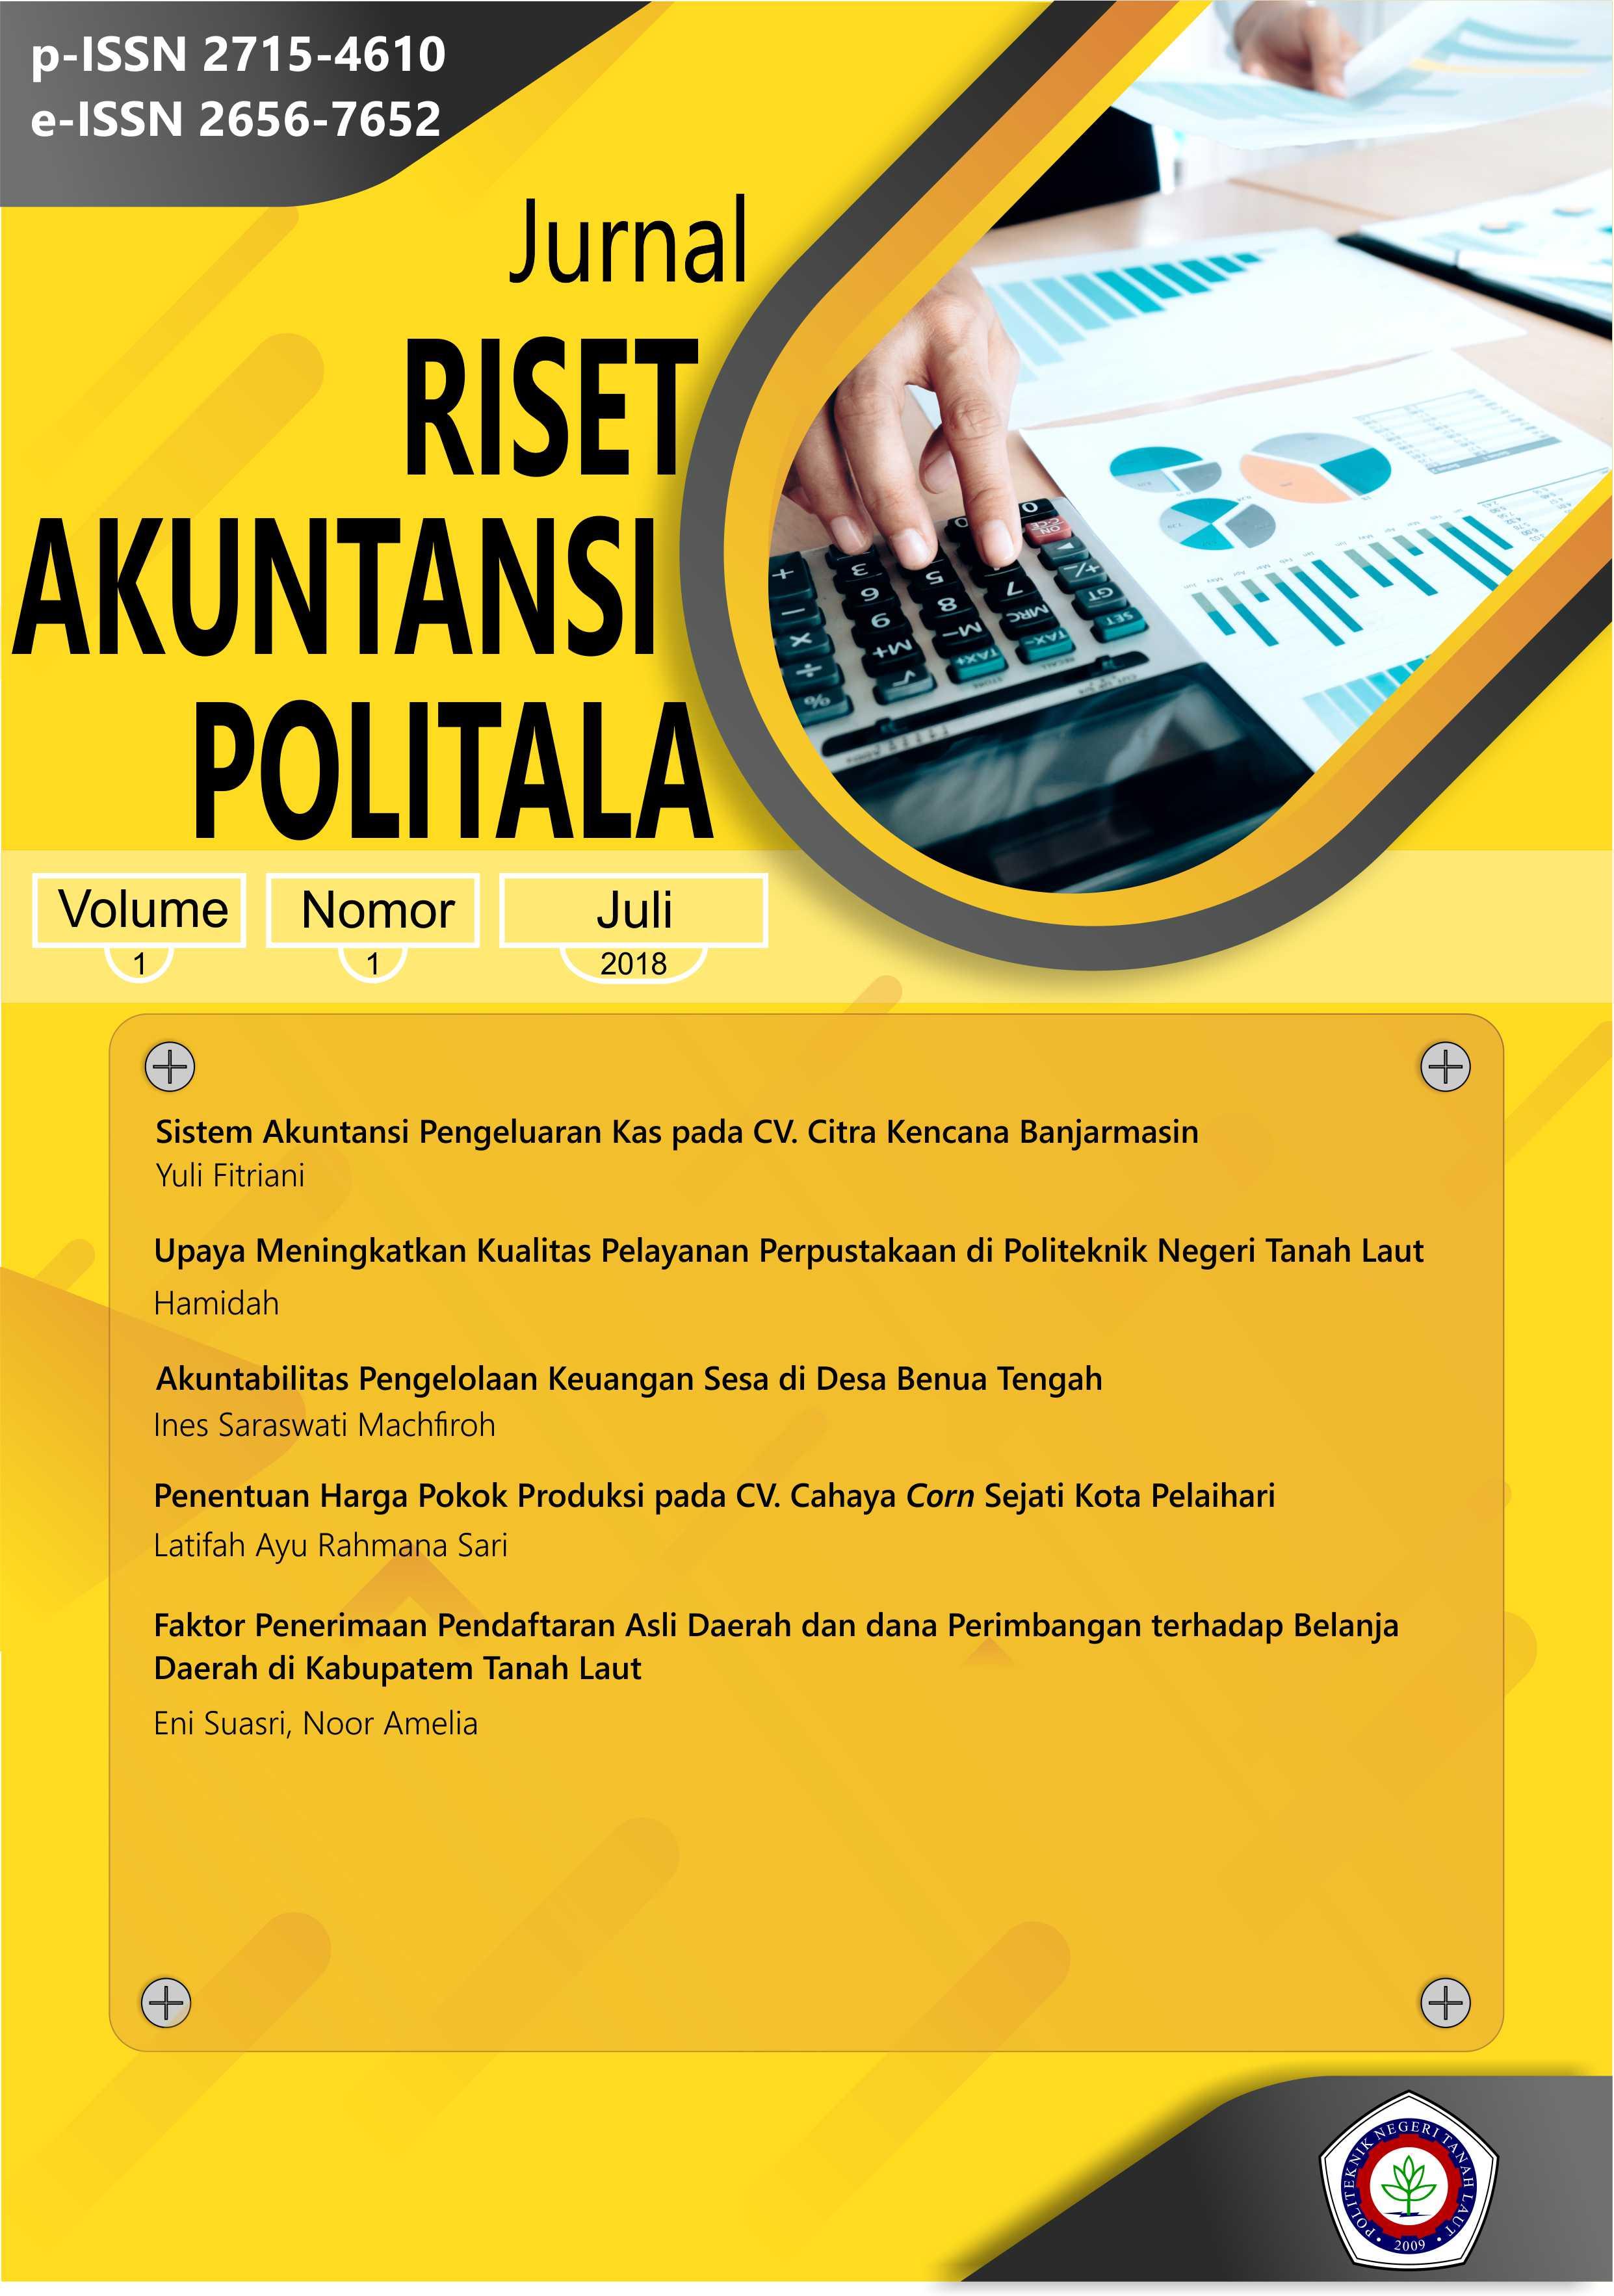 View Vol. 1 No. 1 (2018): Jurnal Riset Akuntansi Politala